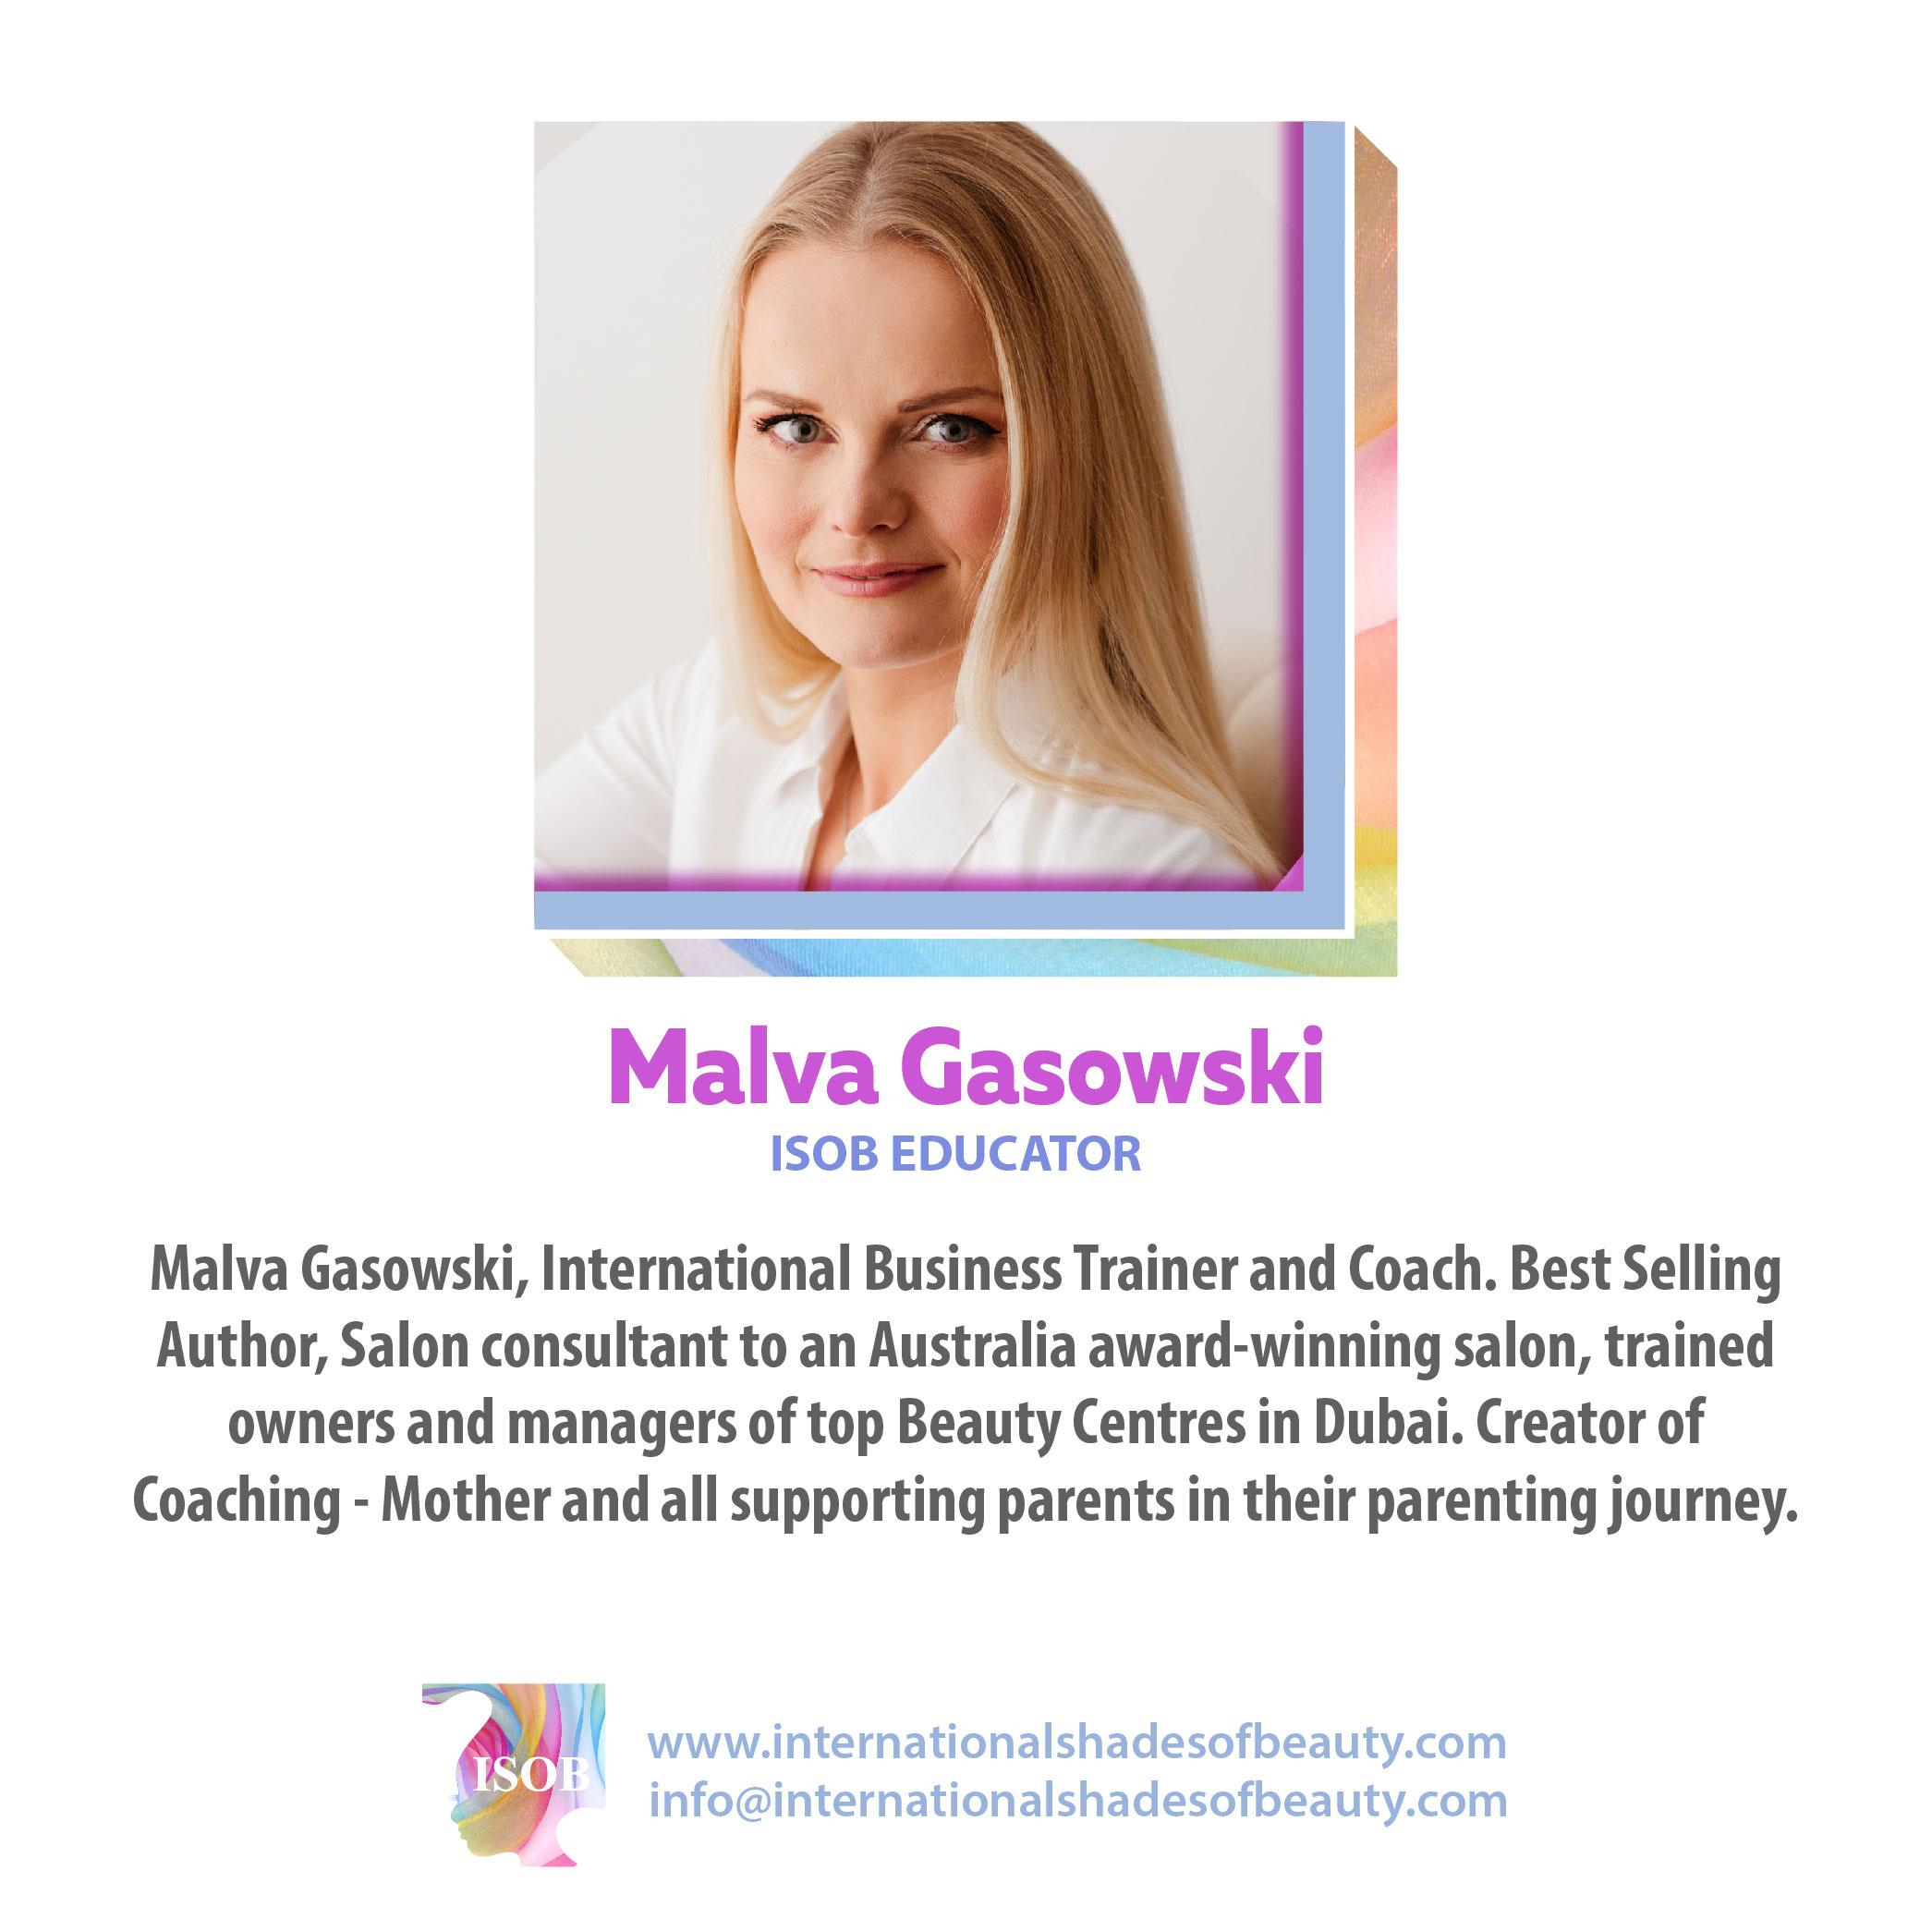 ISOB•_Malva Gasowski